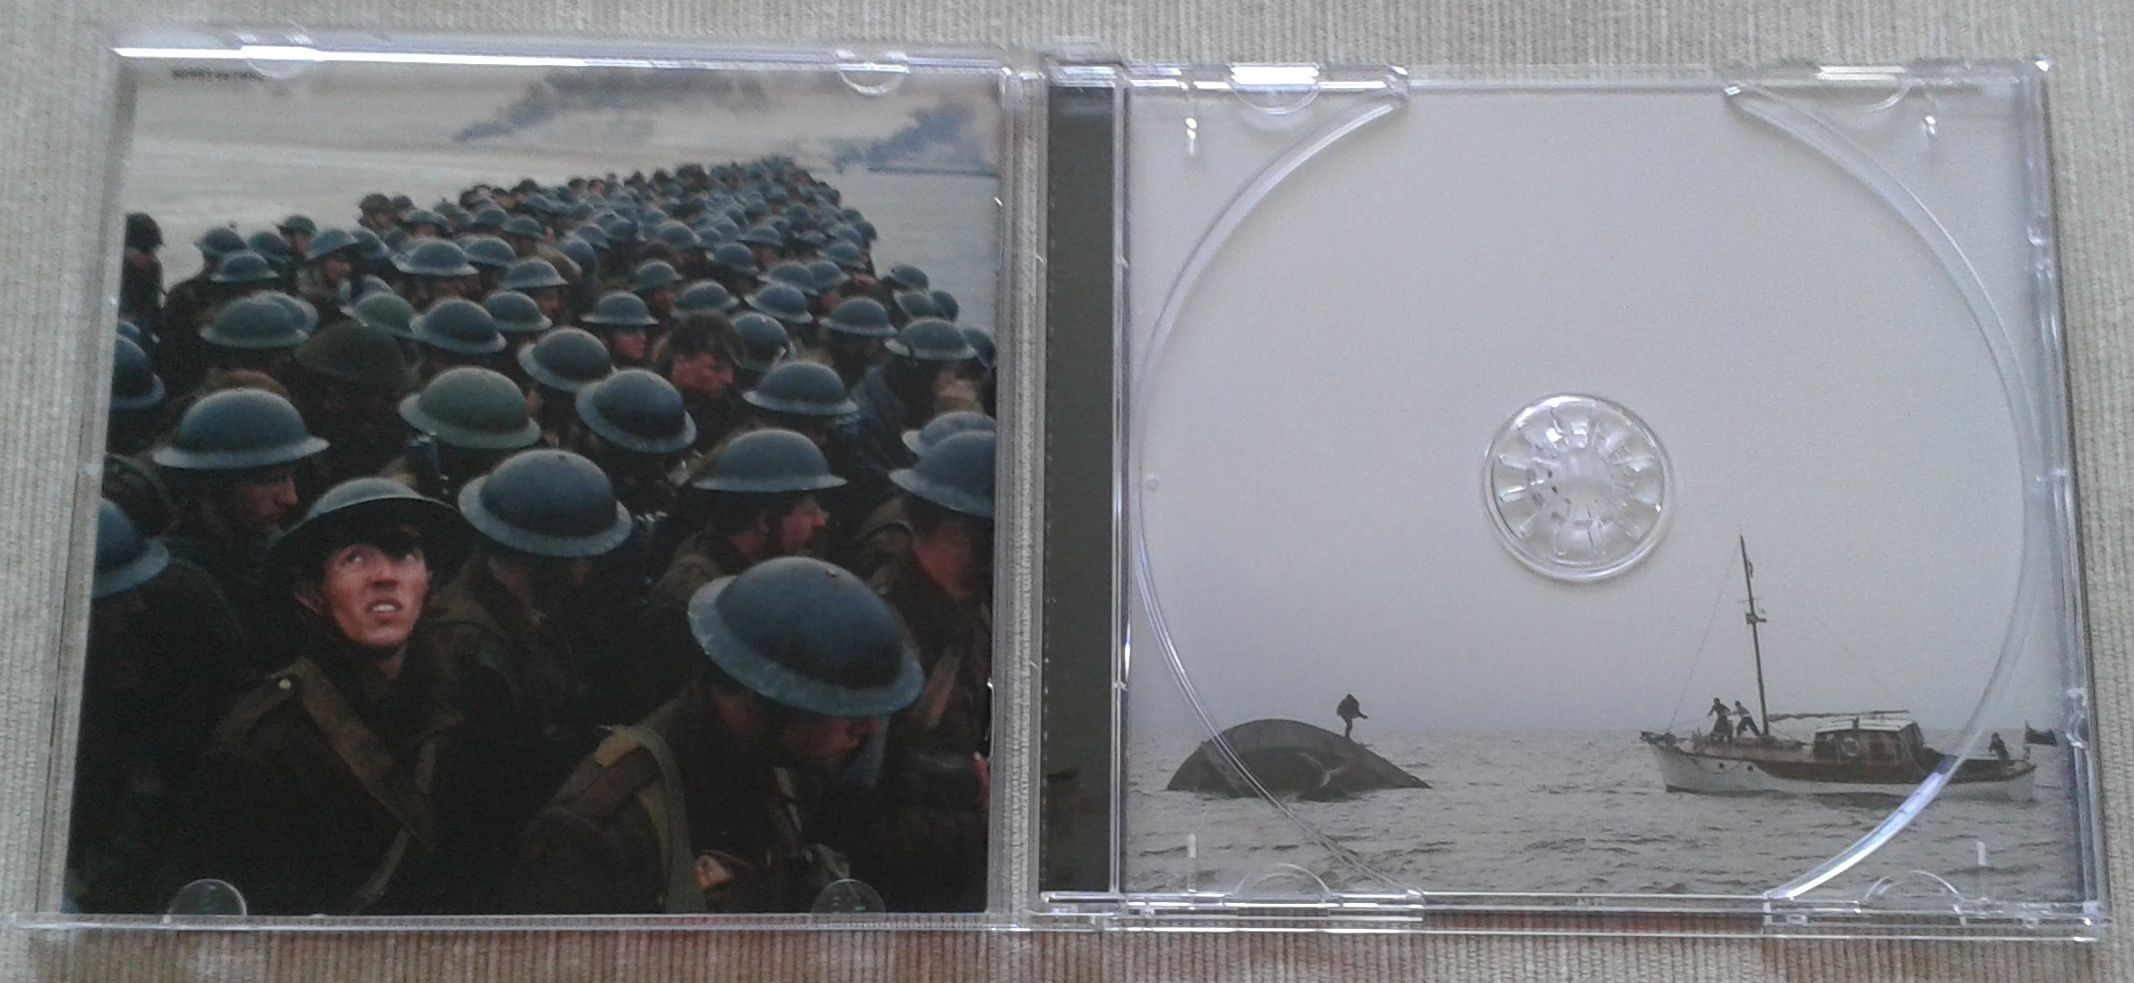 4. Dunkirk środek bez płyty.jpg